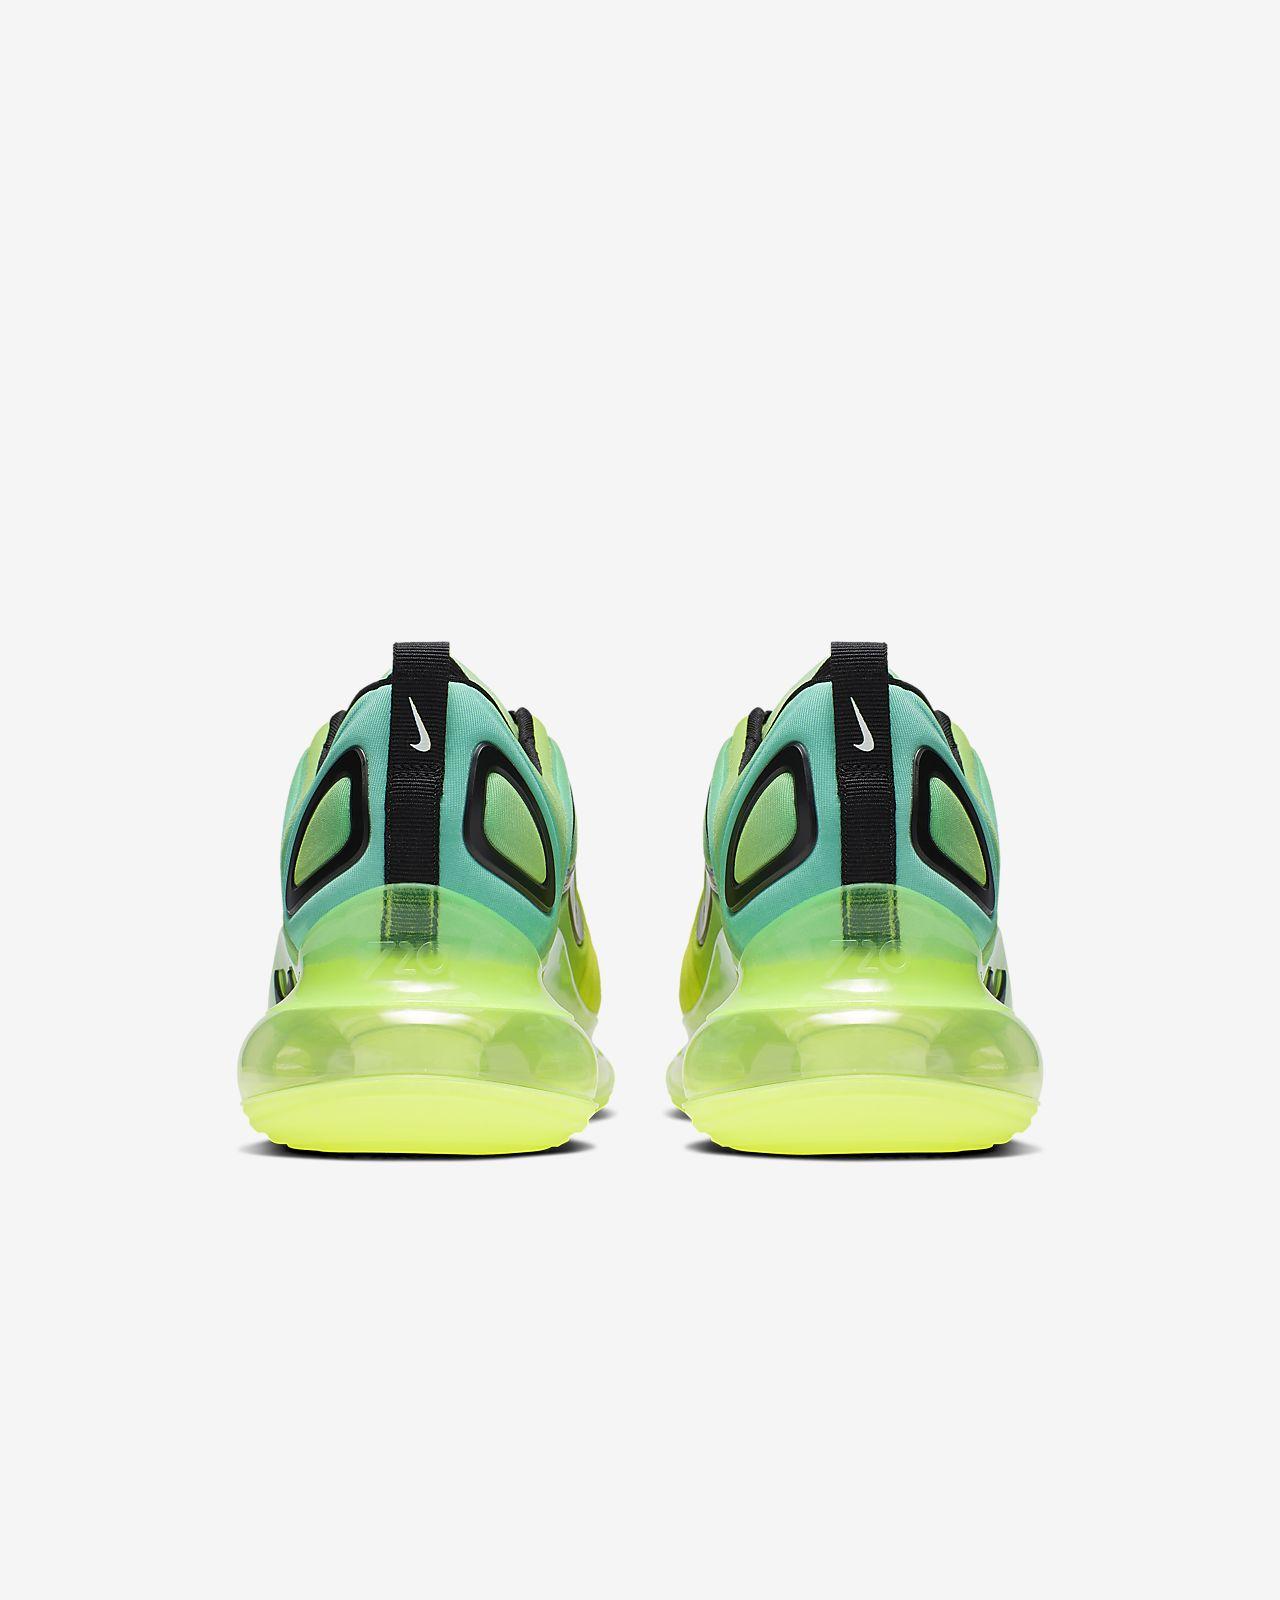 ad1559a7ce Nike Air Max 720 Men's Shoe. Nike.com